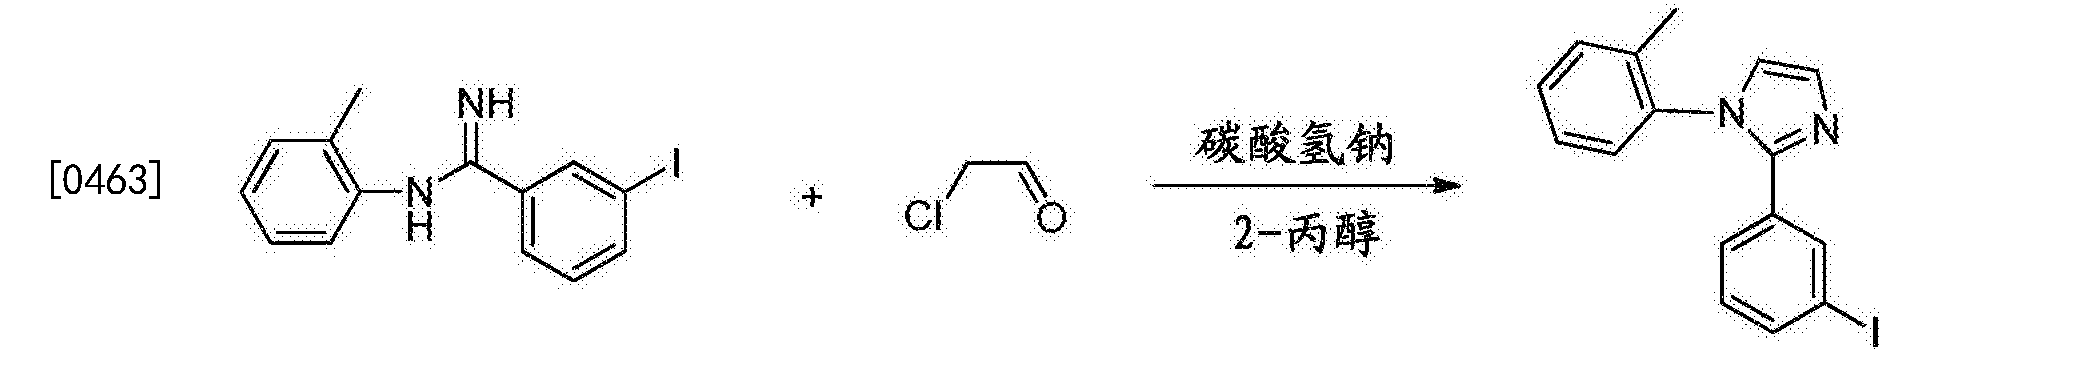 Figure CN106749425AD01454